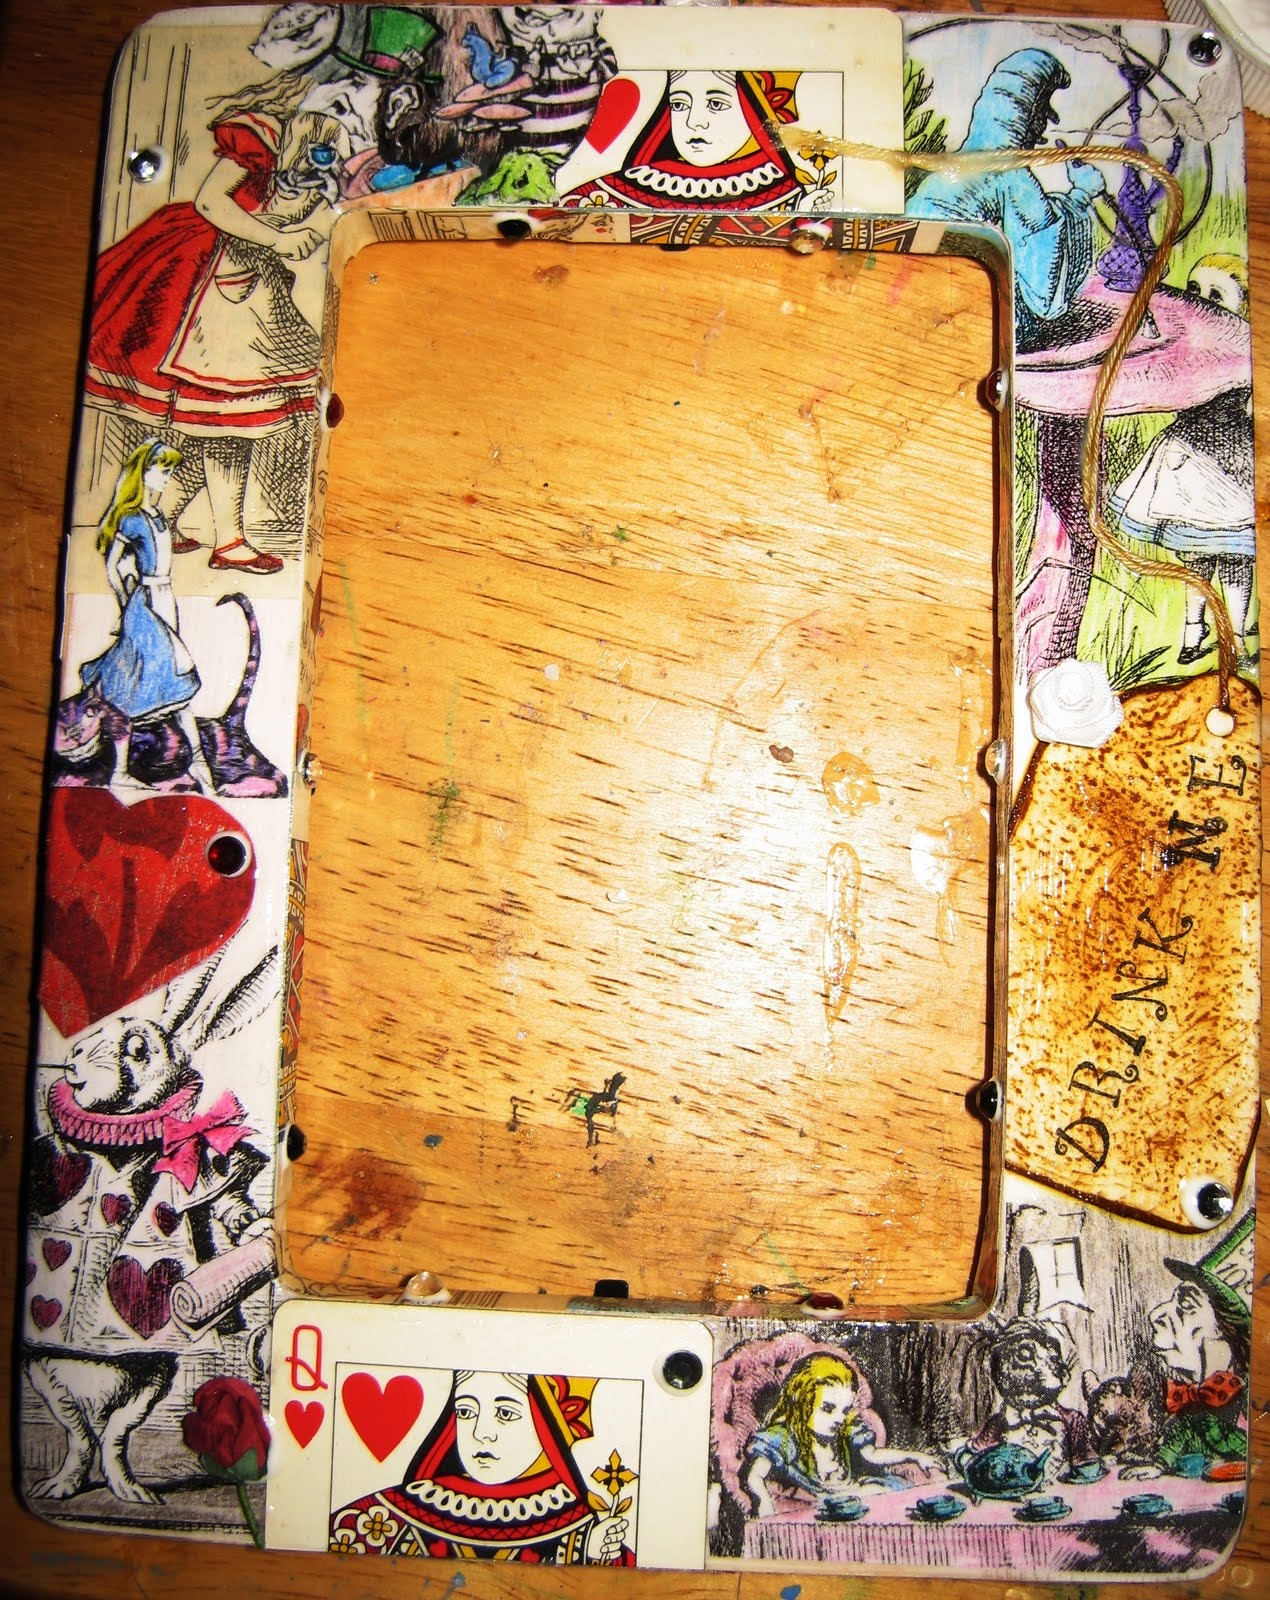 Craft brat alice in wonderland decoupage frame alice in wonderland decoupage frame jeuxipadfo Image collections